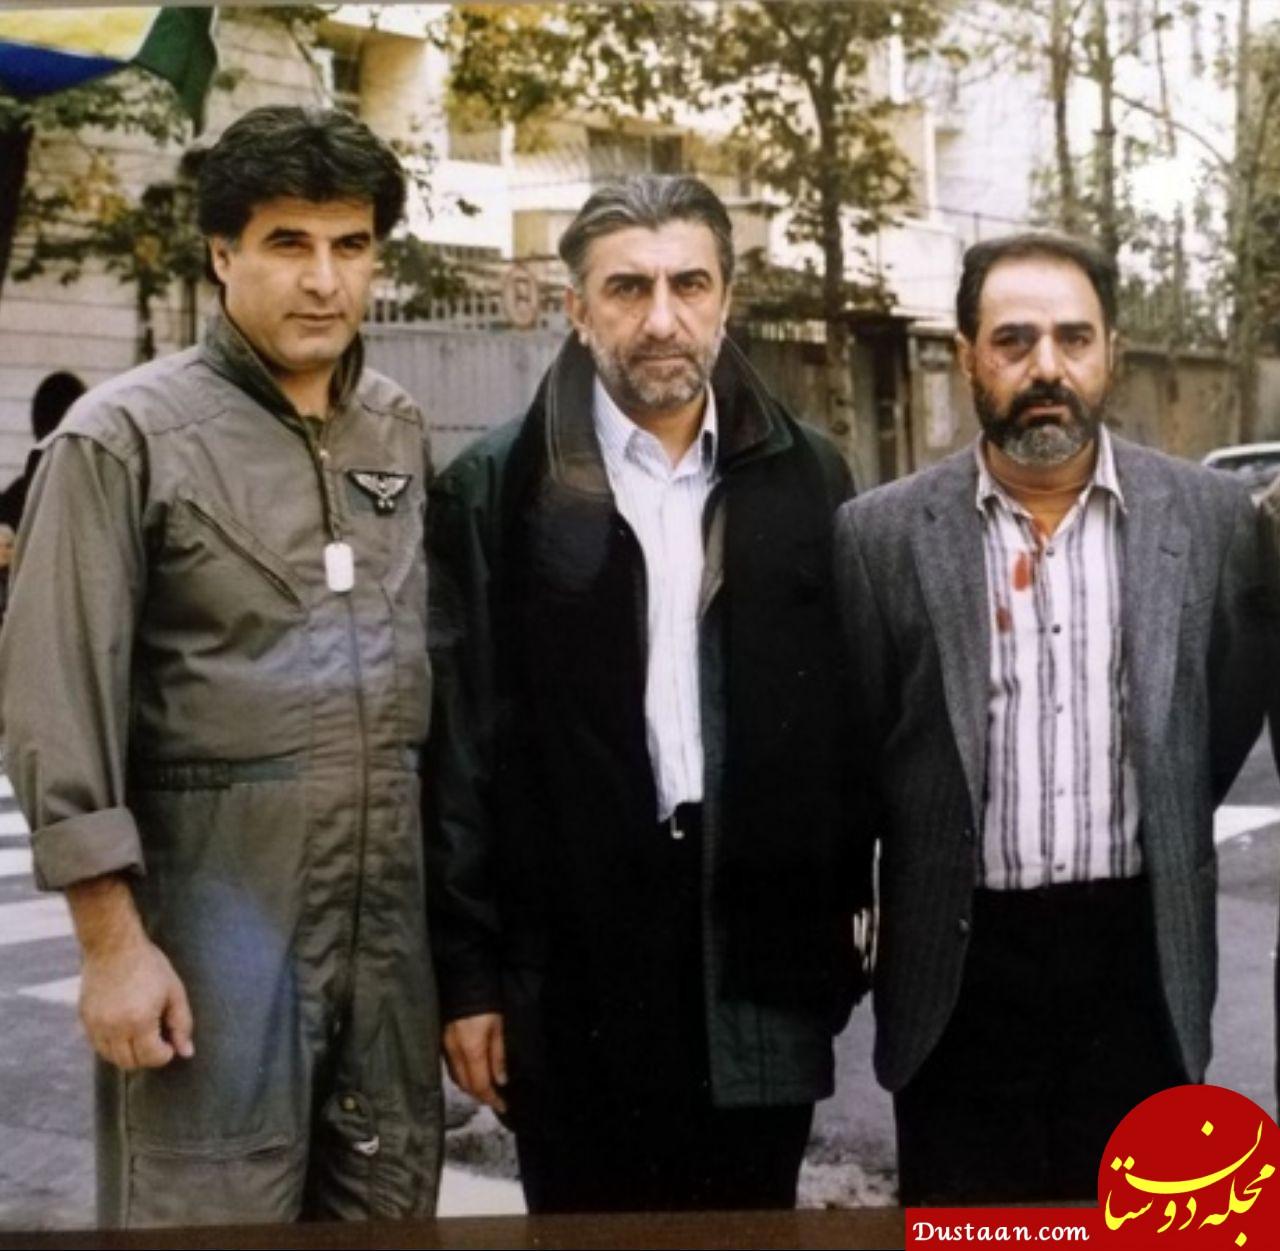 www.dustaan.com کاپیتان اسماعیل وحید درگذشت +عکس